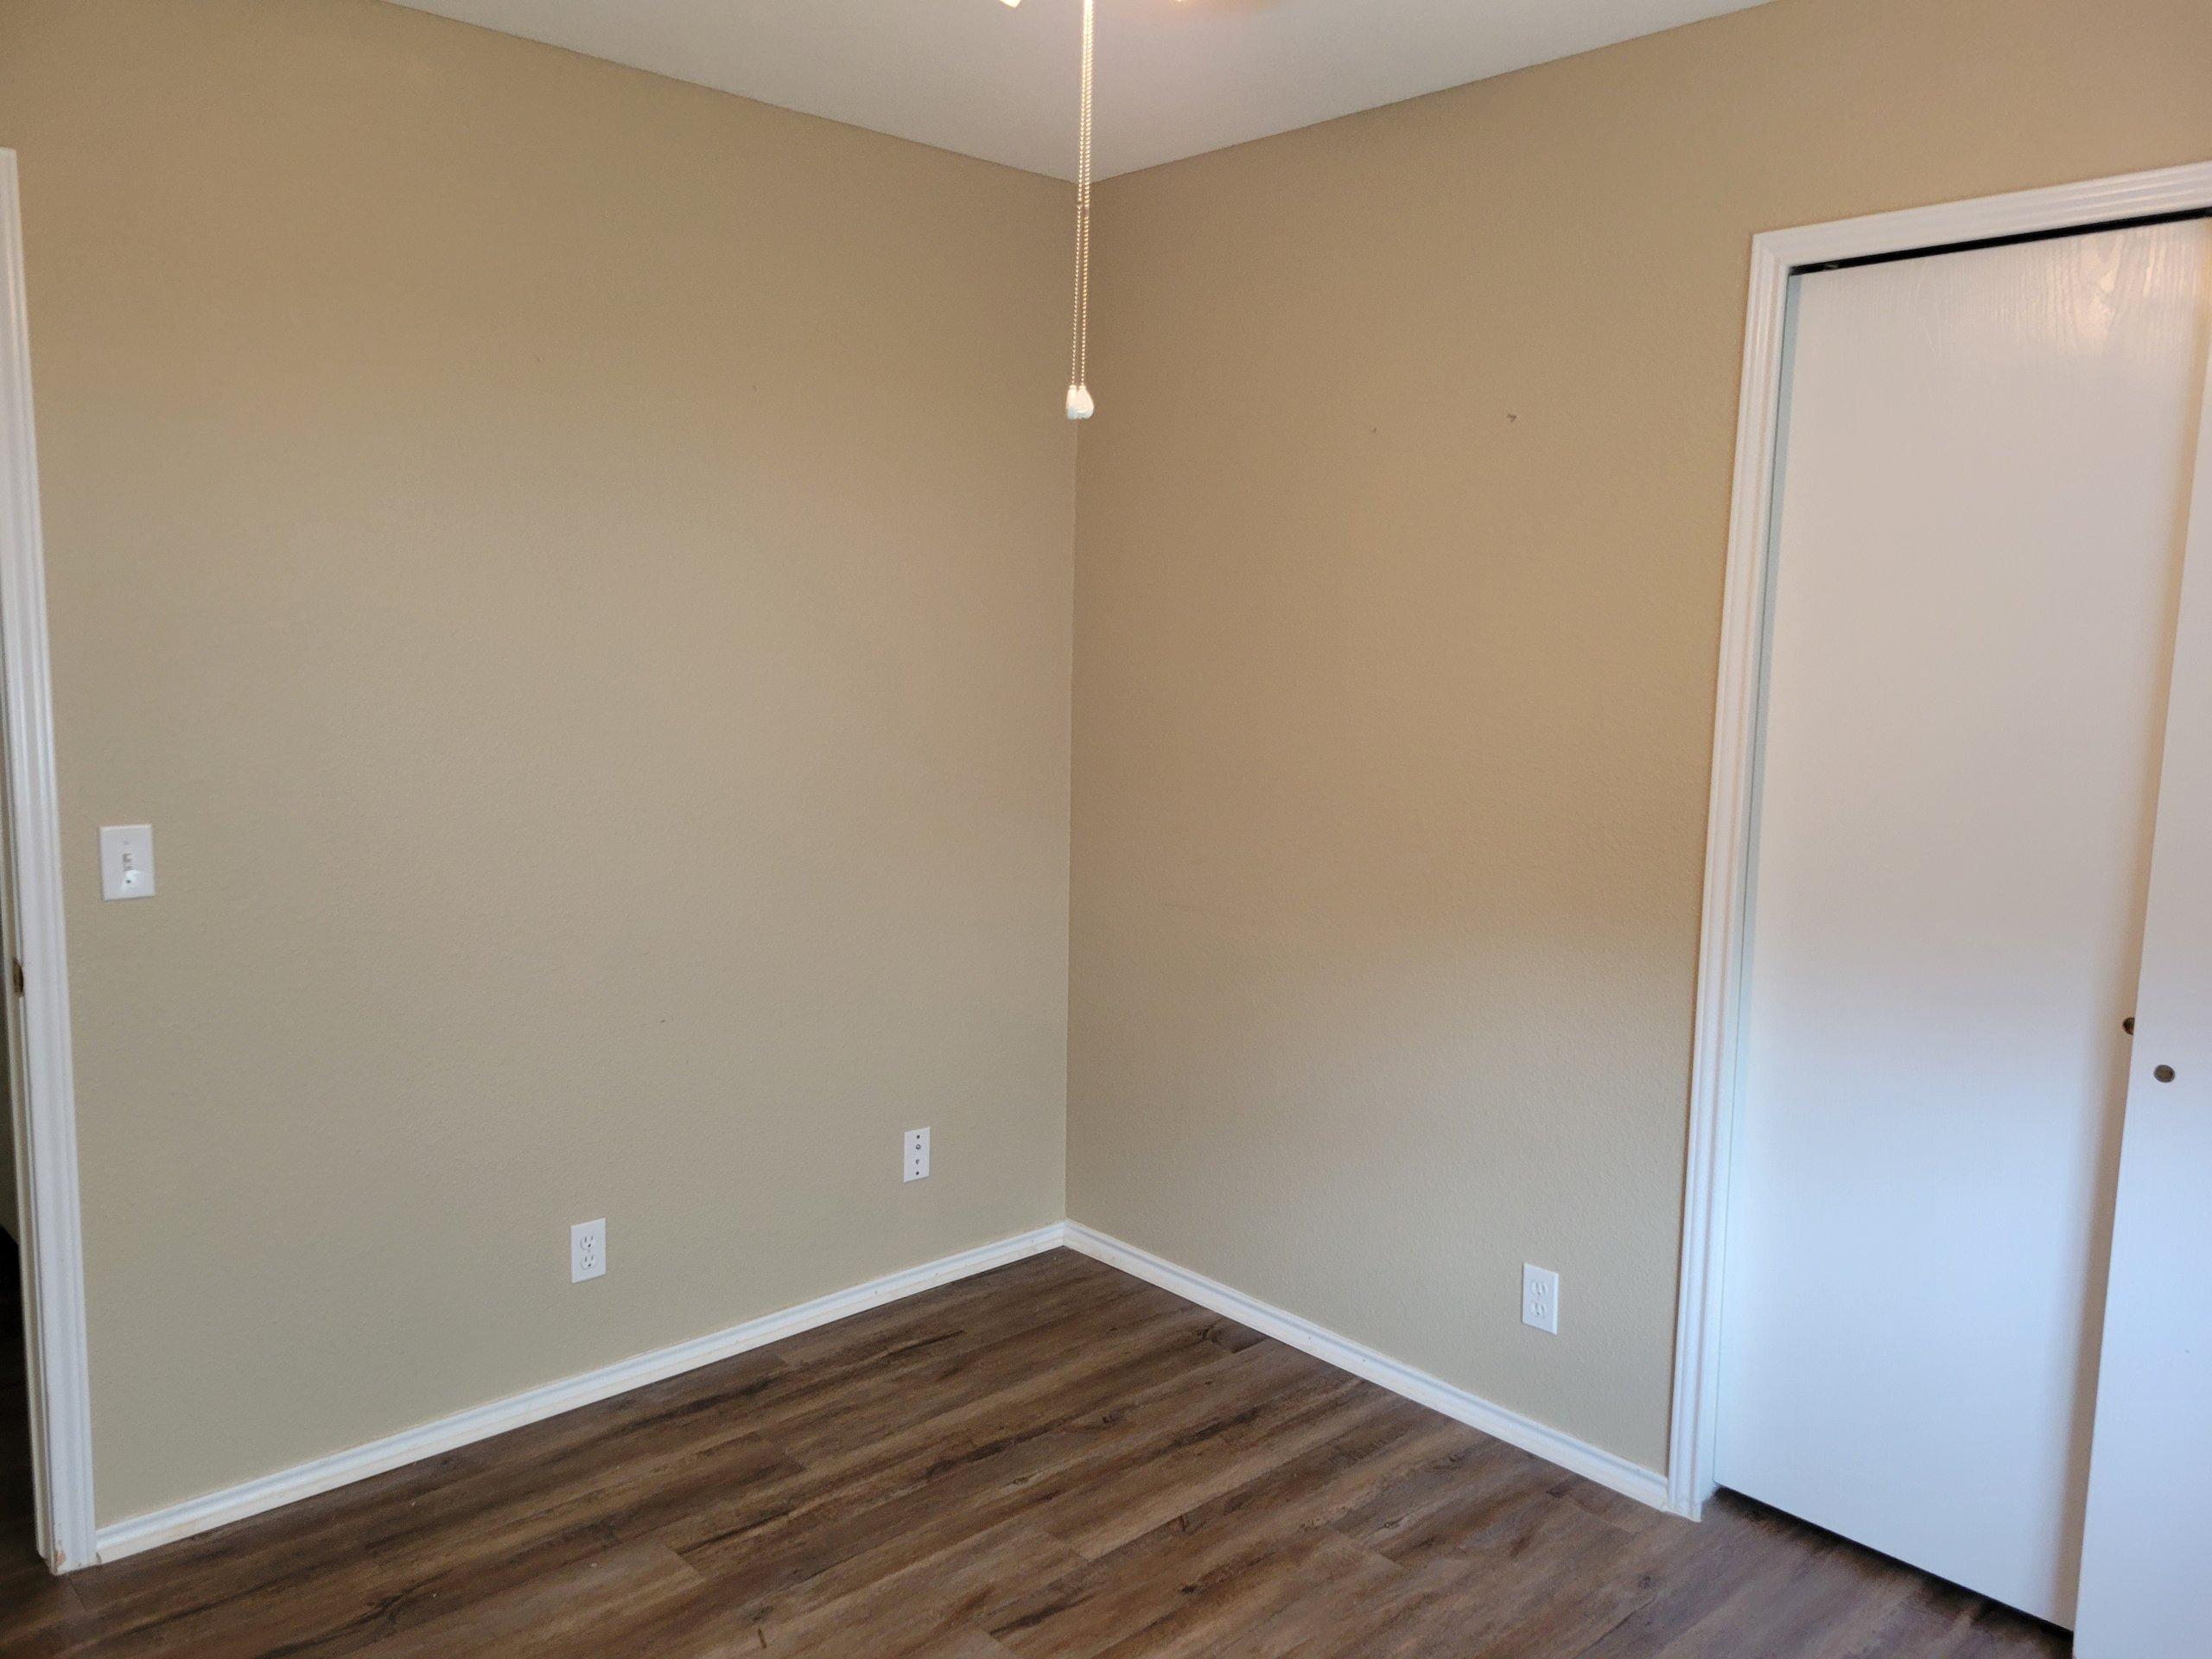 10x10 Bedroom self storage unit